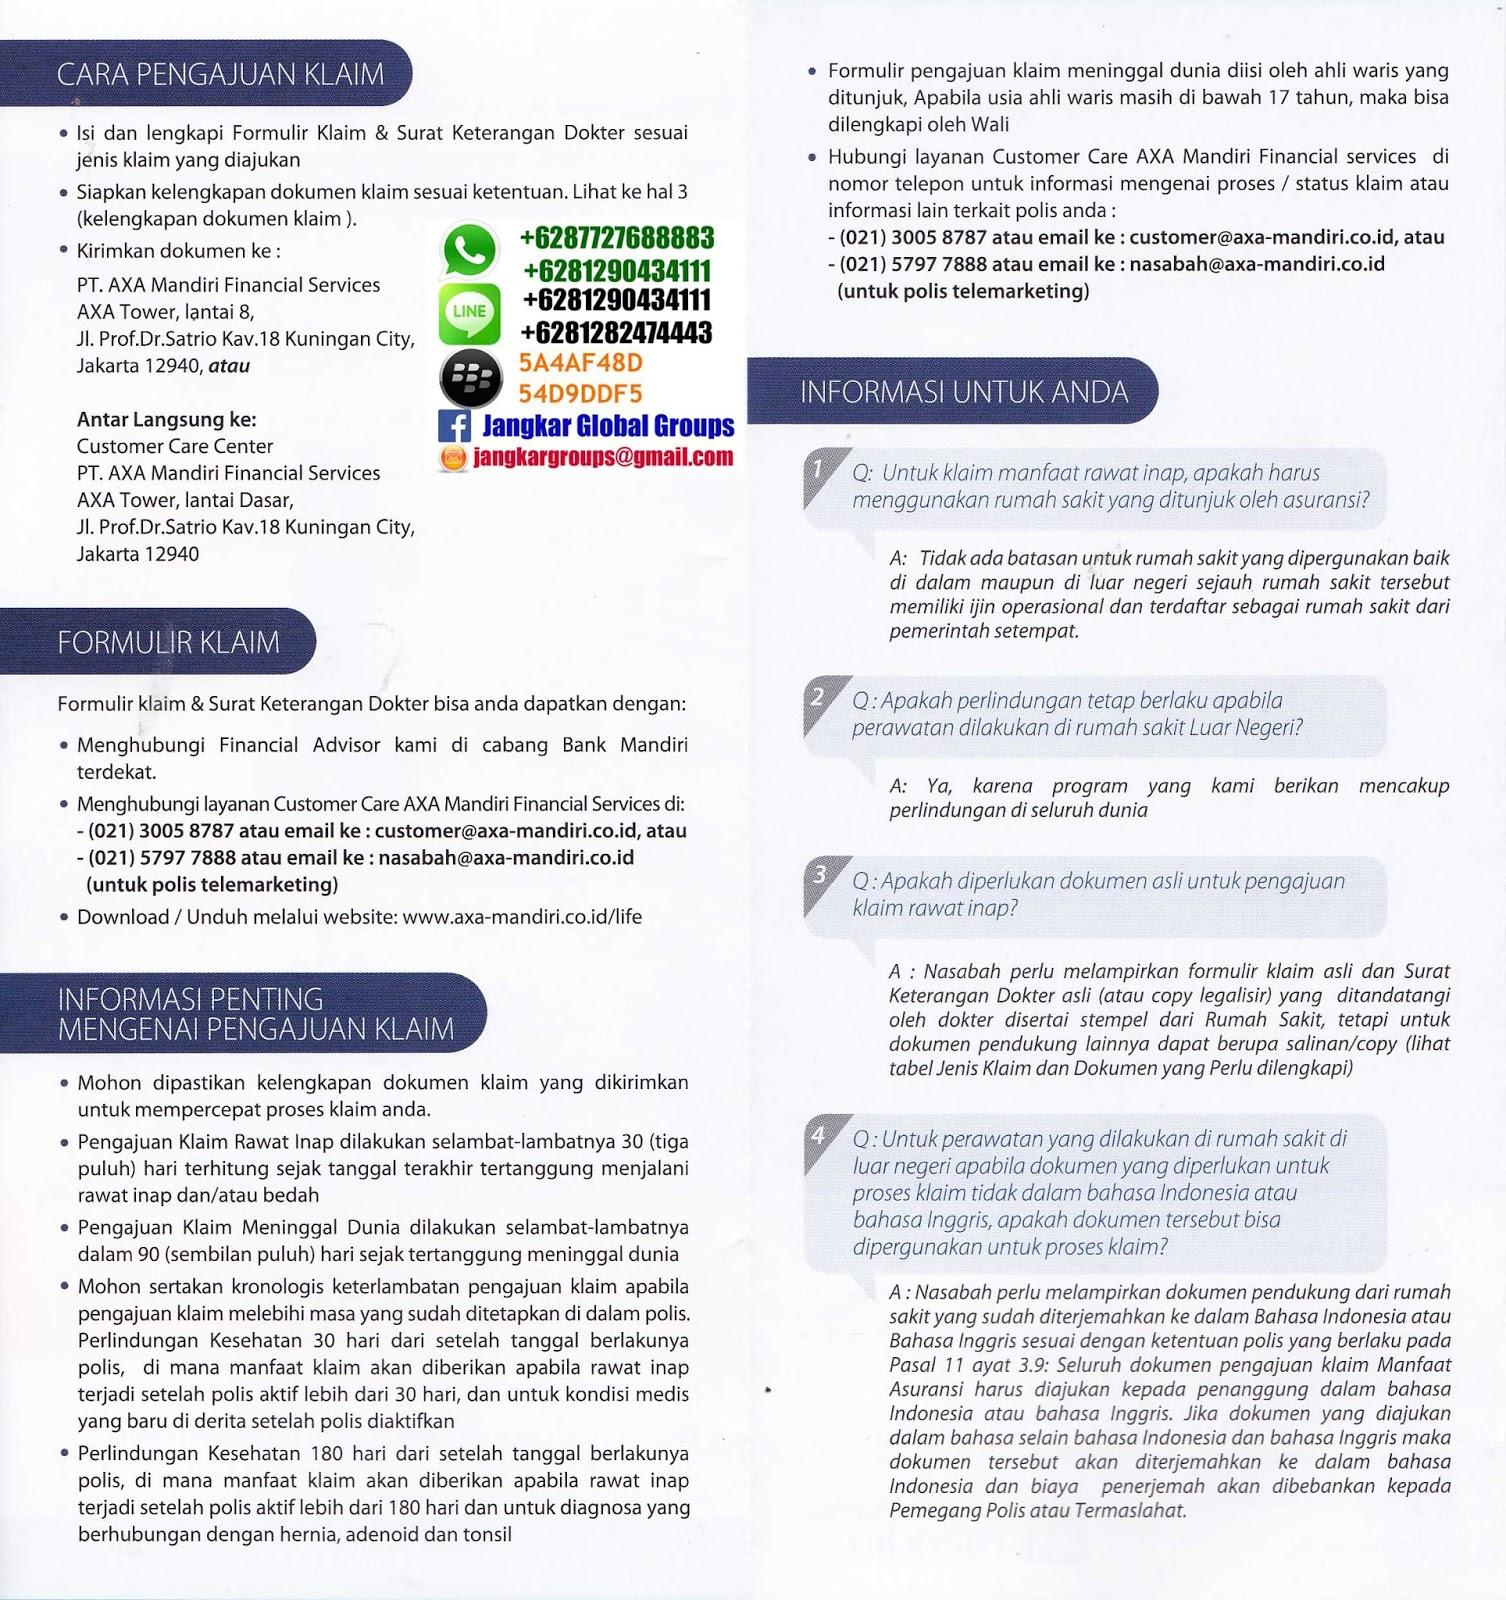 Jangkar Groups: KLAIM ASURANSI AXA MANDIRI